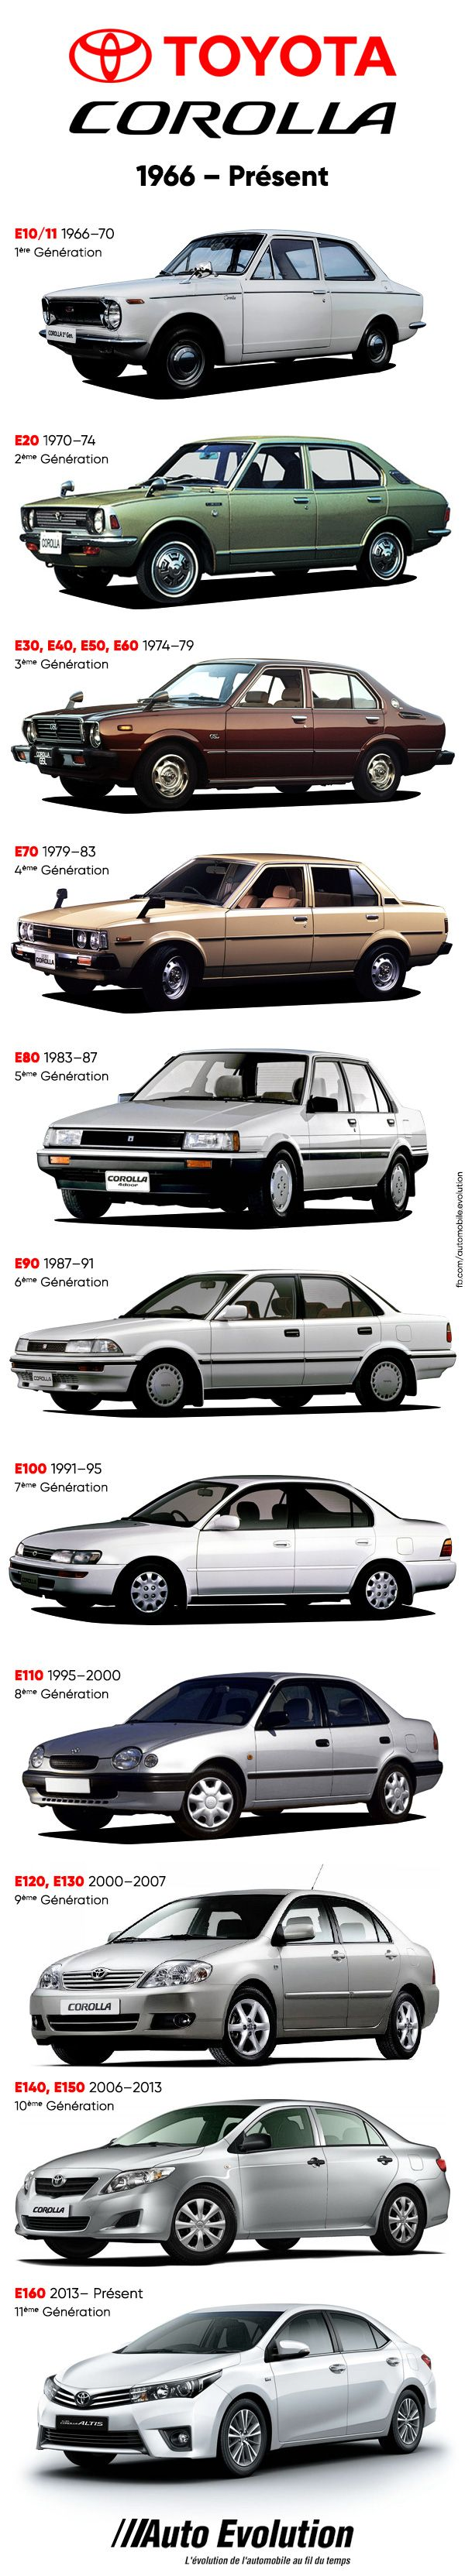 Toyota Corolla History